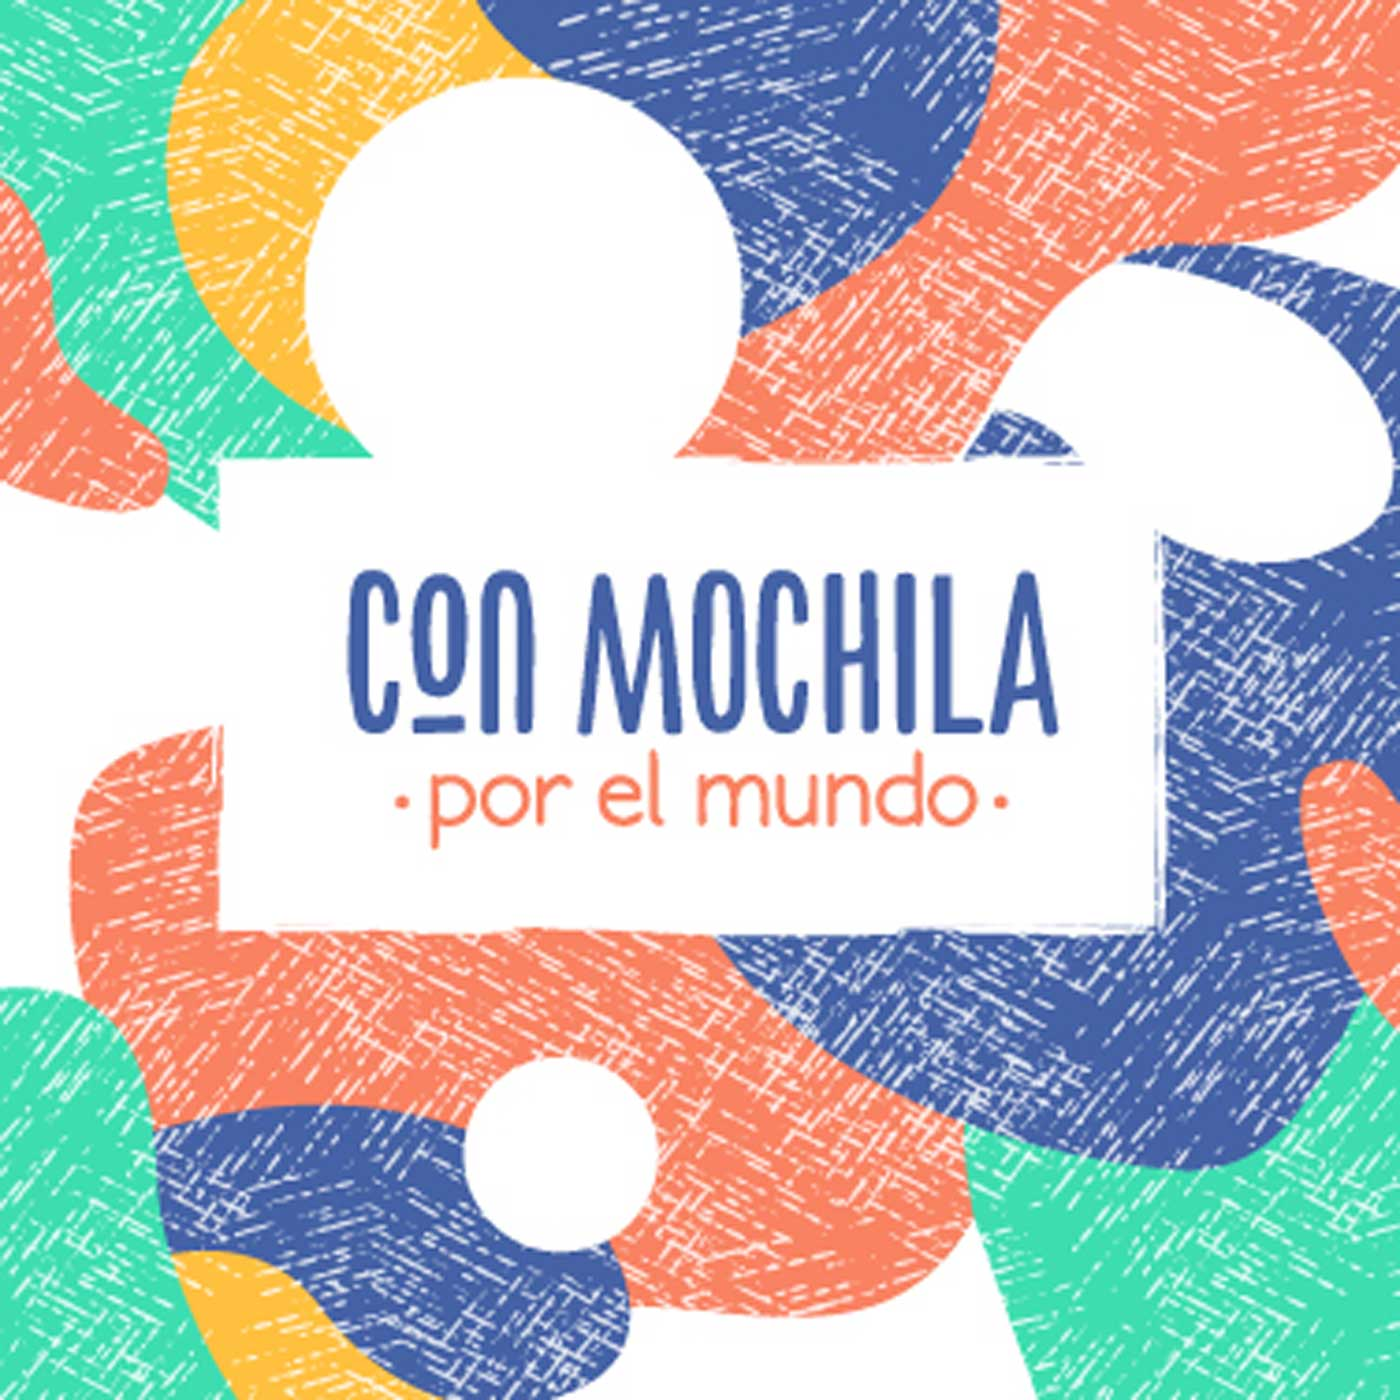 Podcast de Viajes (Con Mochila por el Mundo) show art